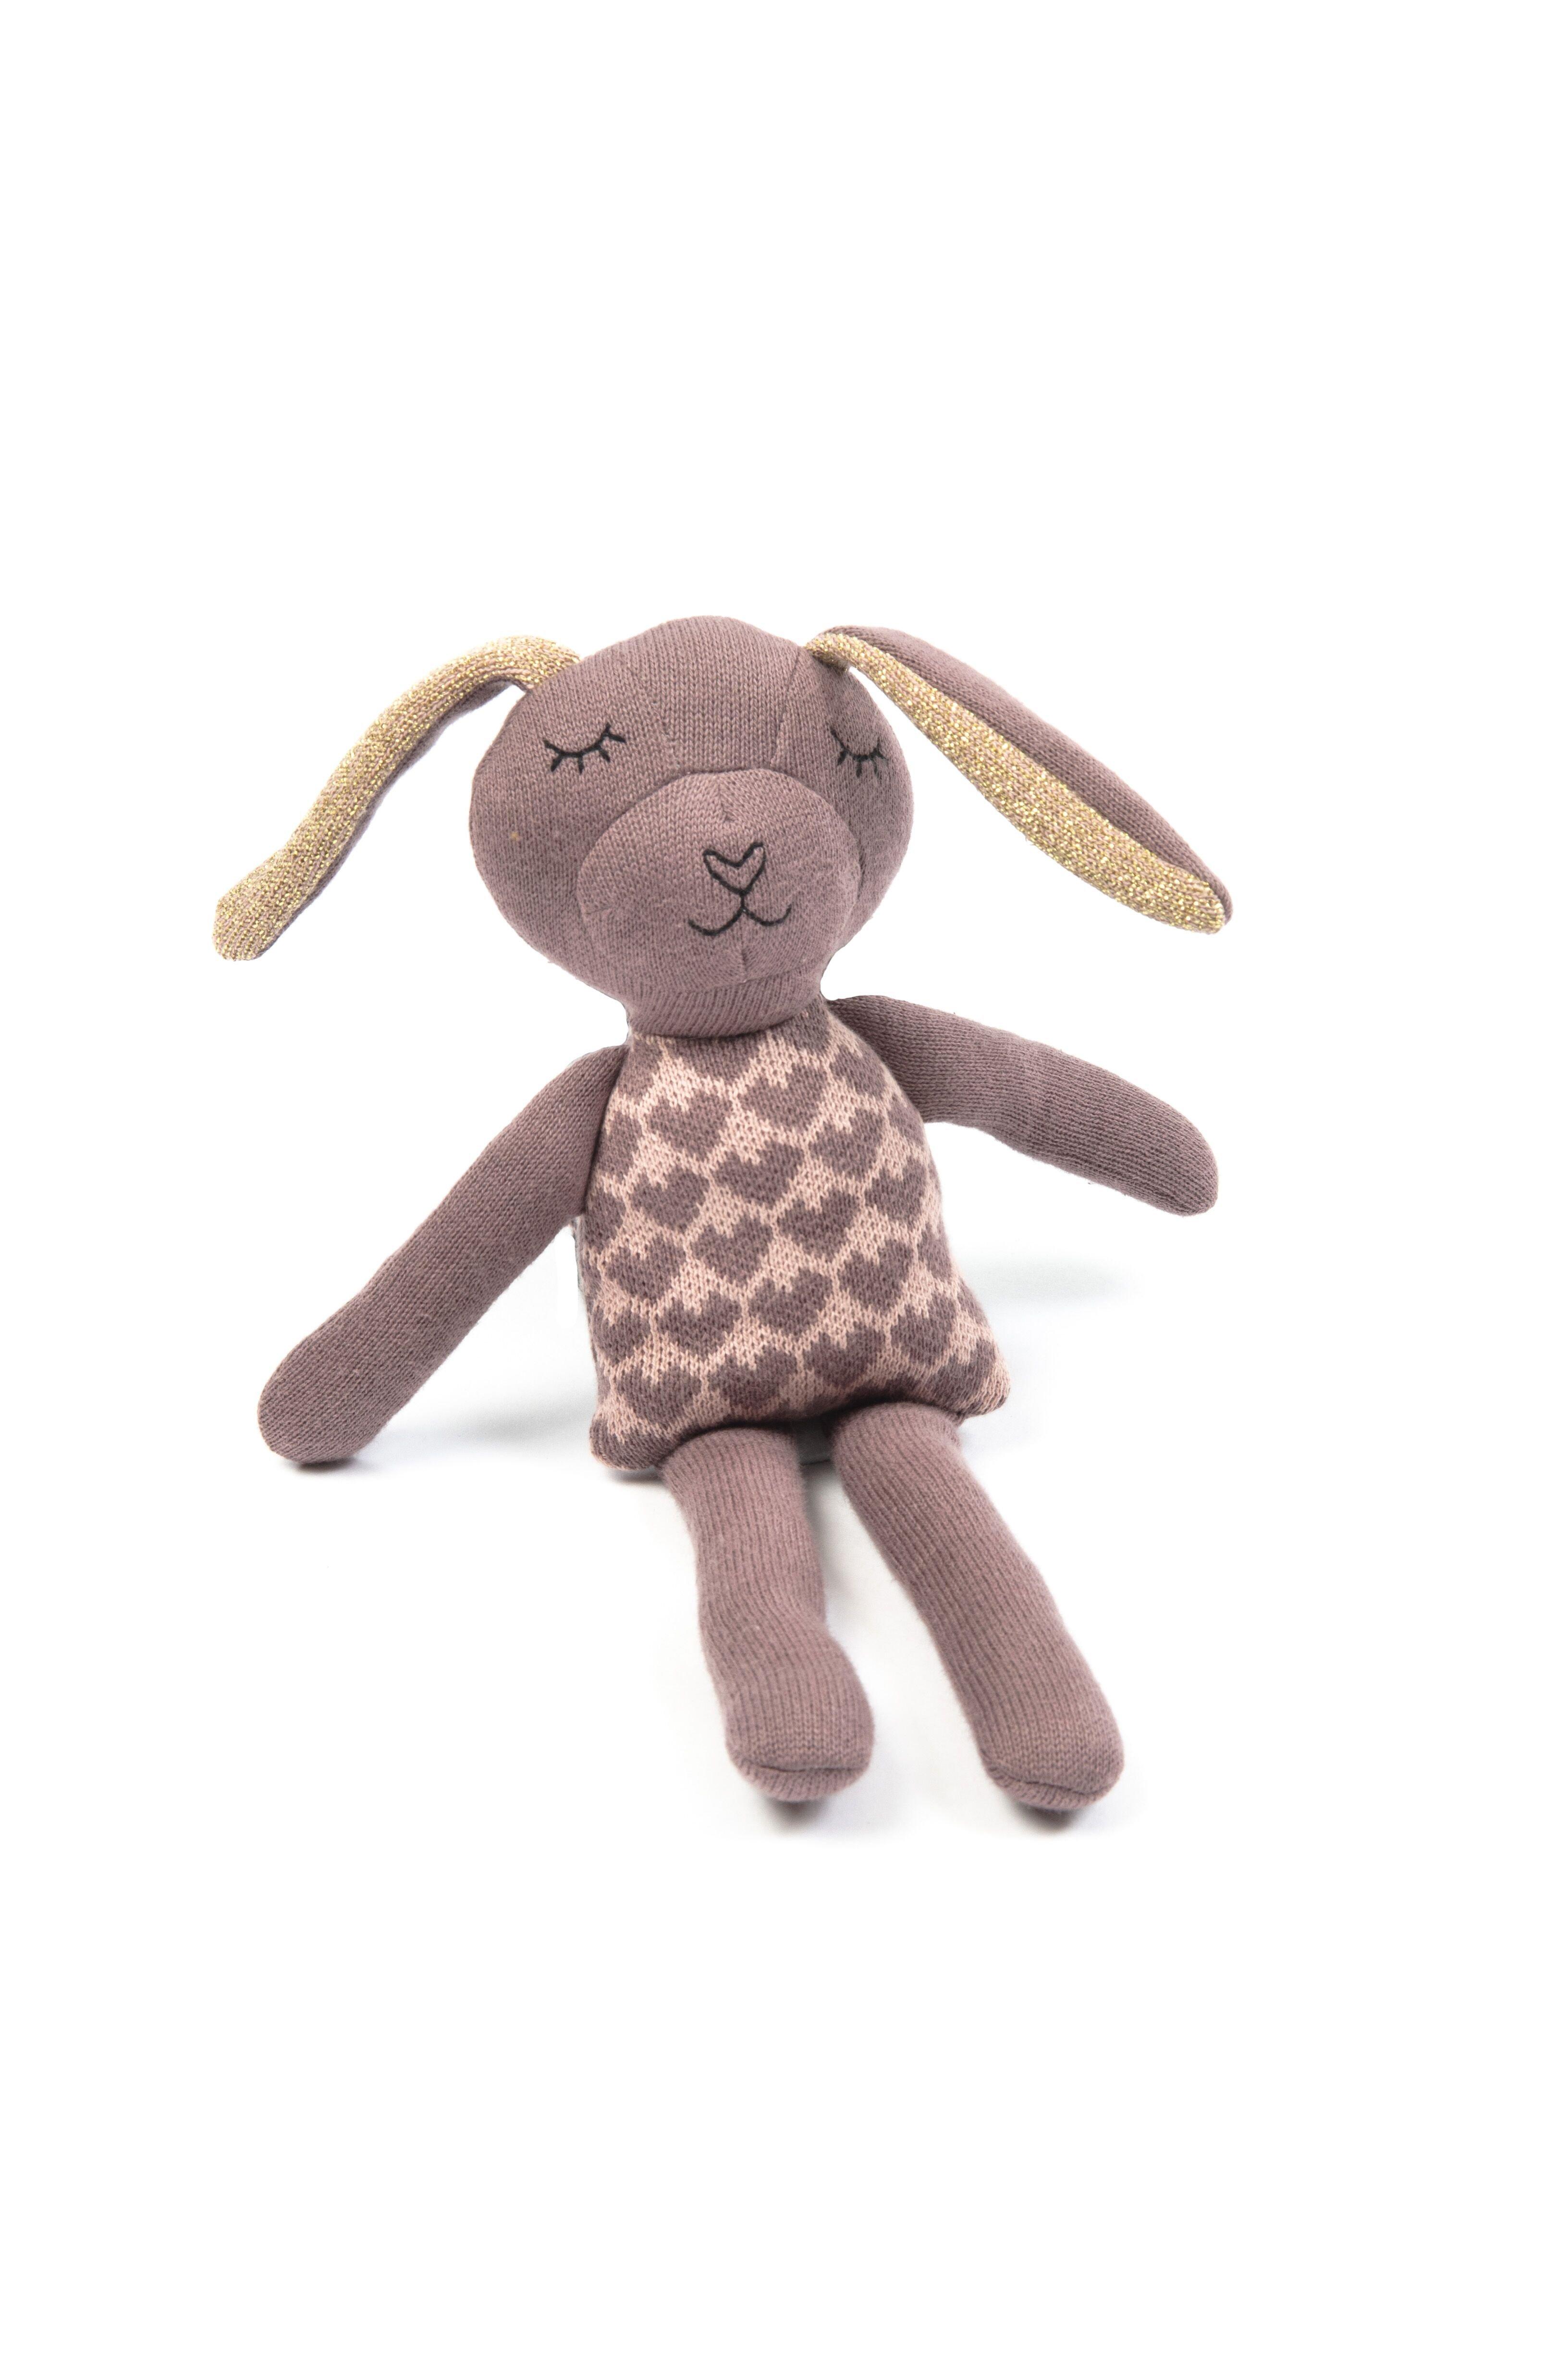 Smallstuff - Activity Toy Bianca The Rabbit - Powder